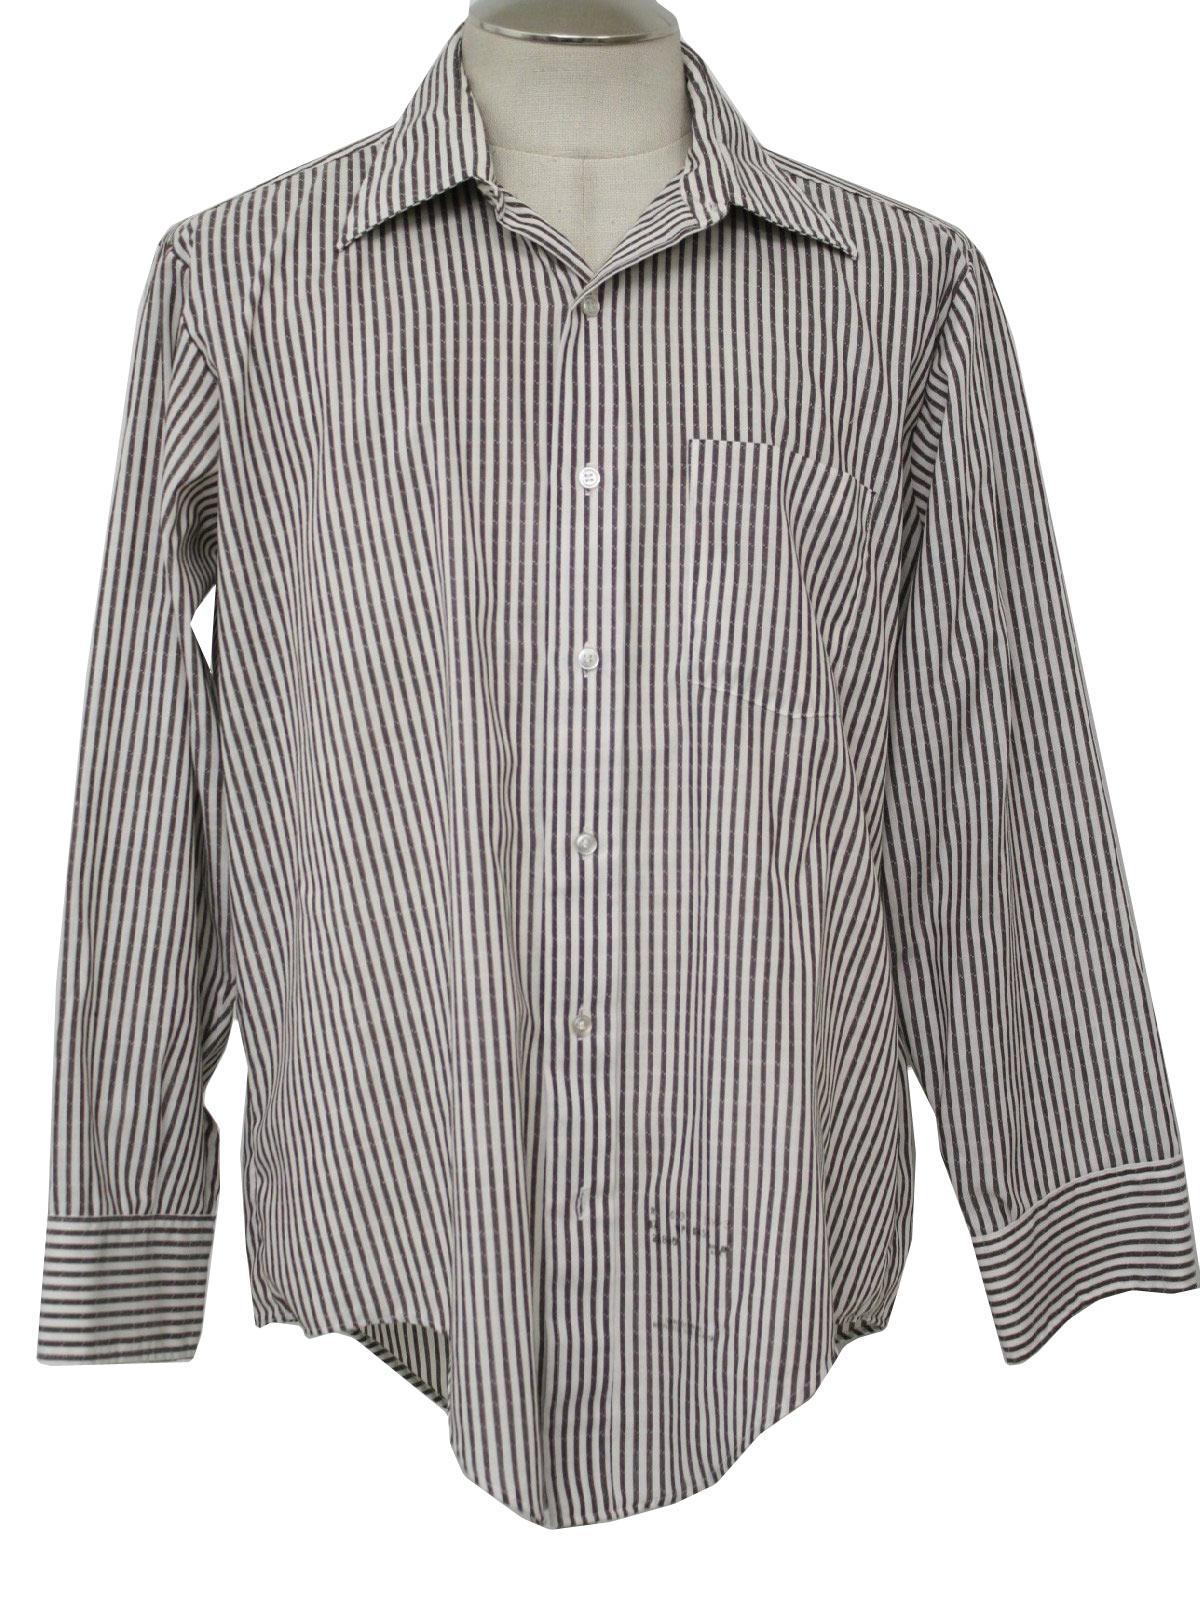 1960s retro shirt late 60s golden vee mens brown